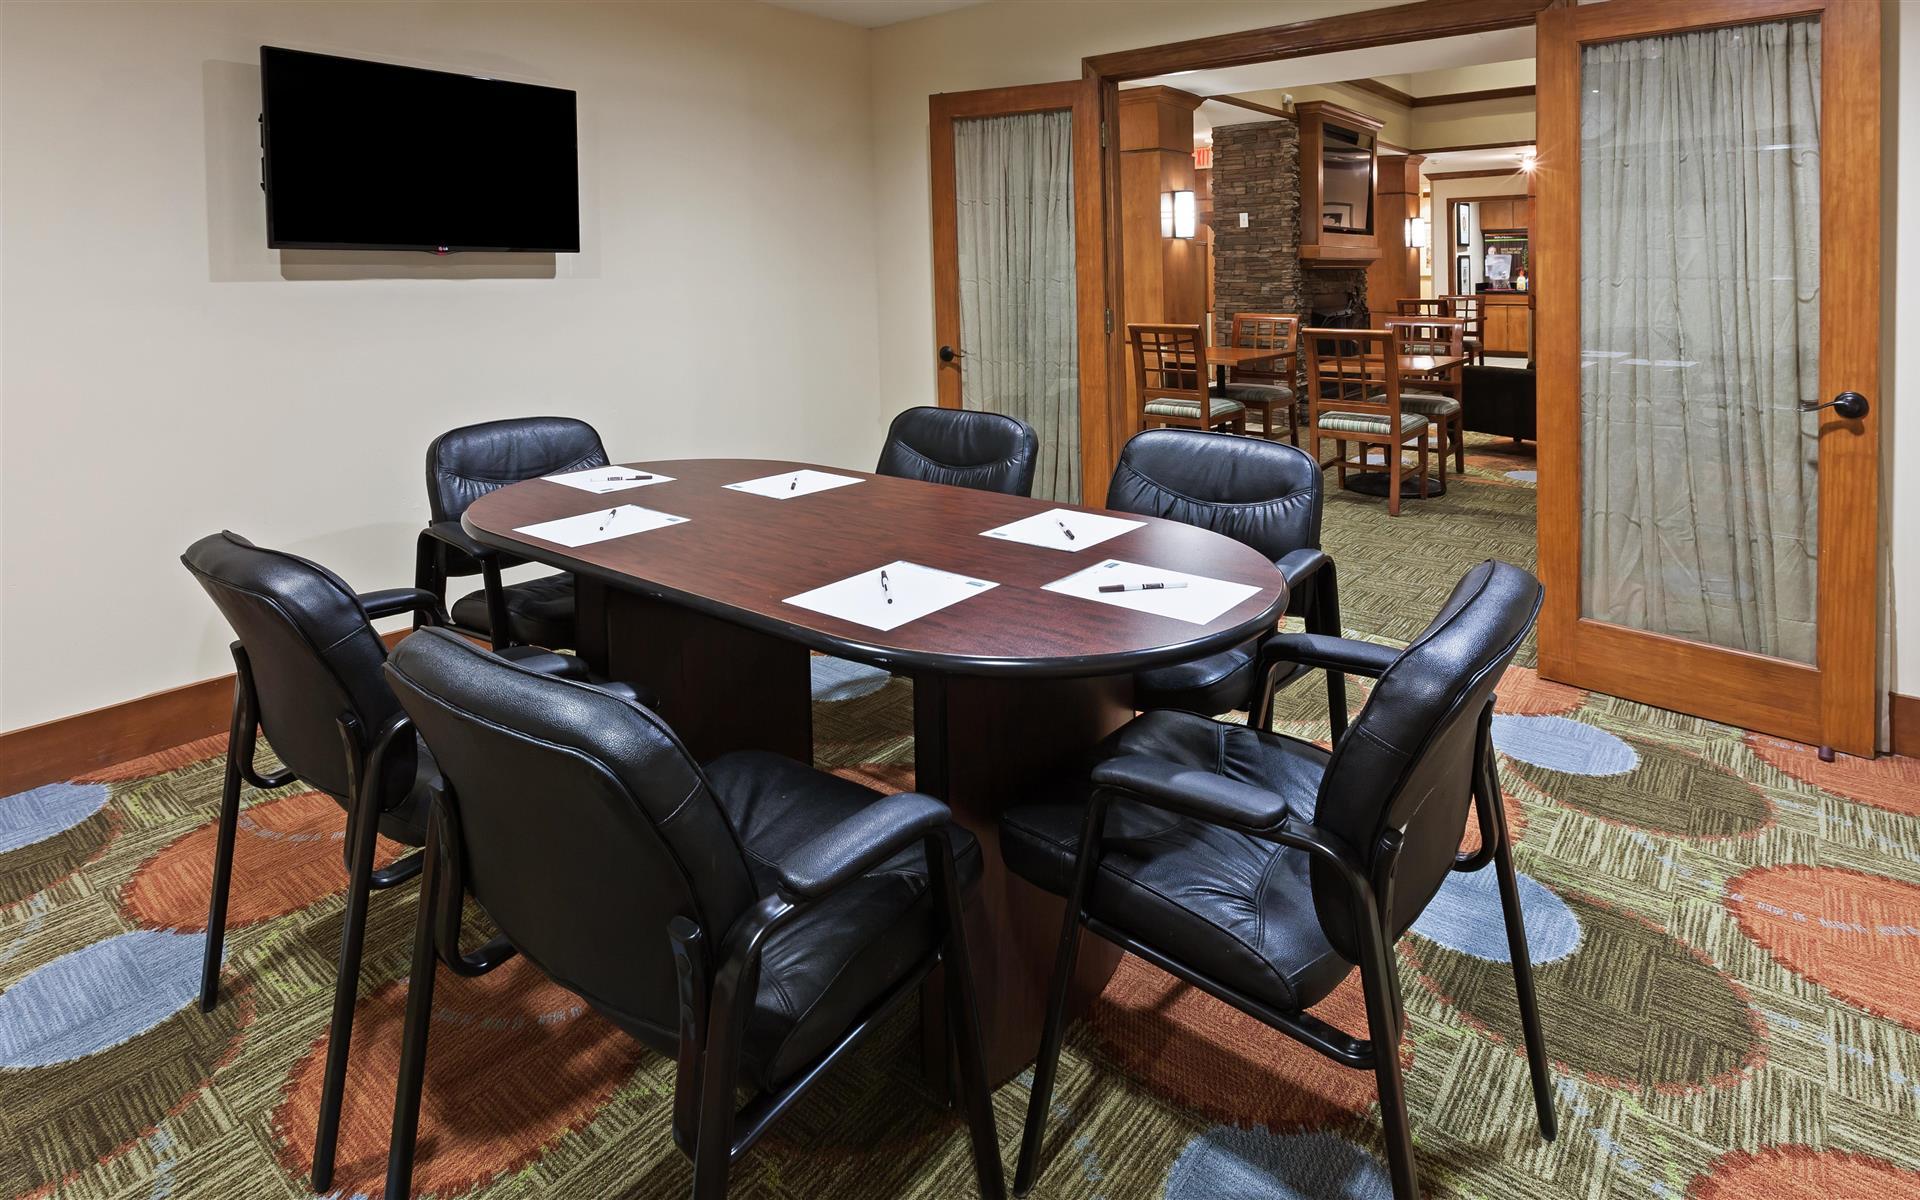 Staybridge Suites NW near Six Flags - The Bluebonnet Room